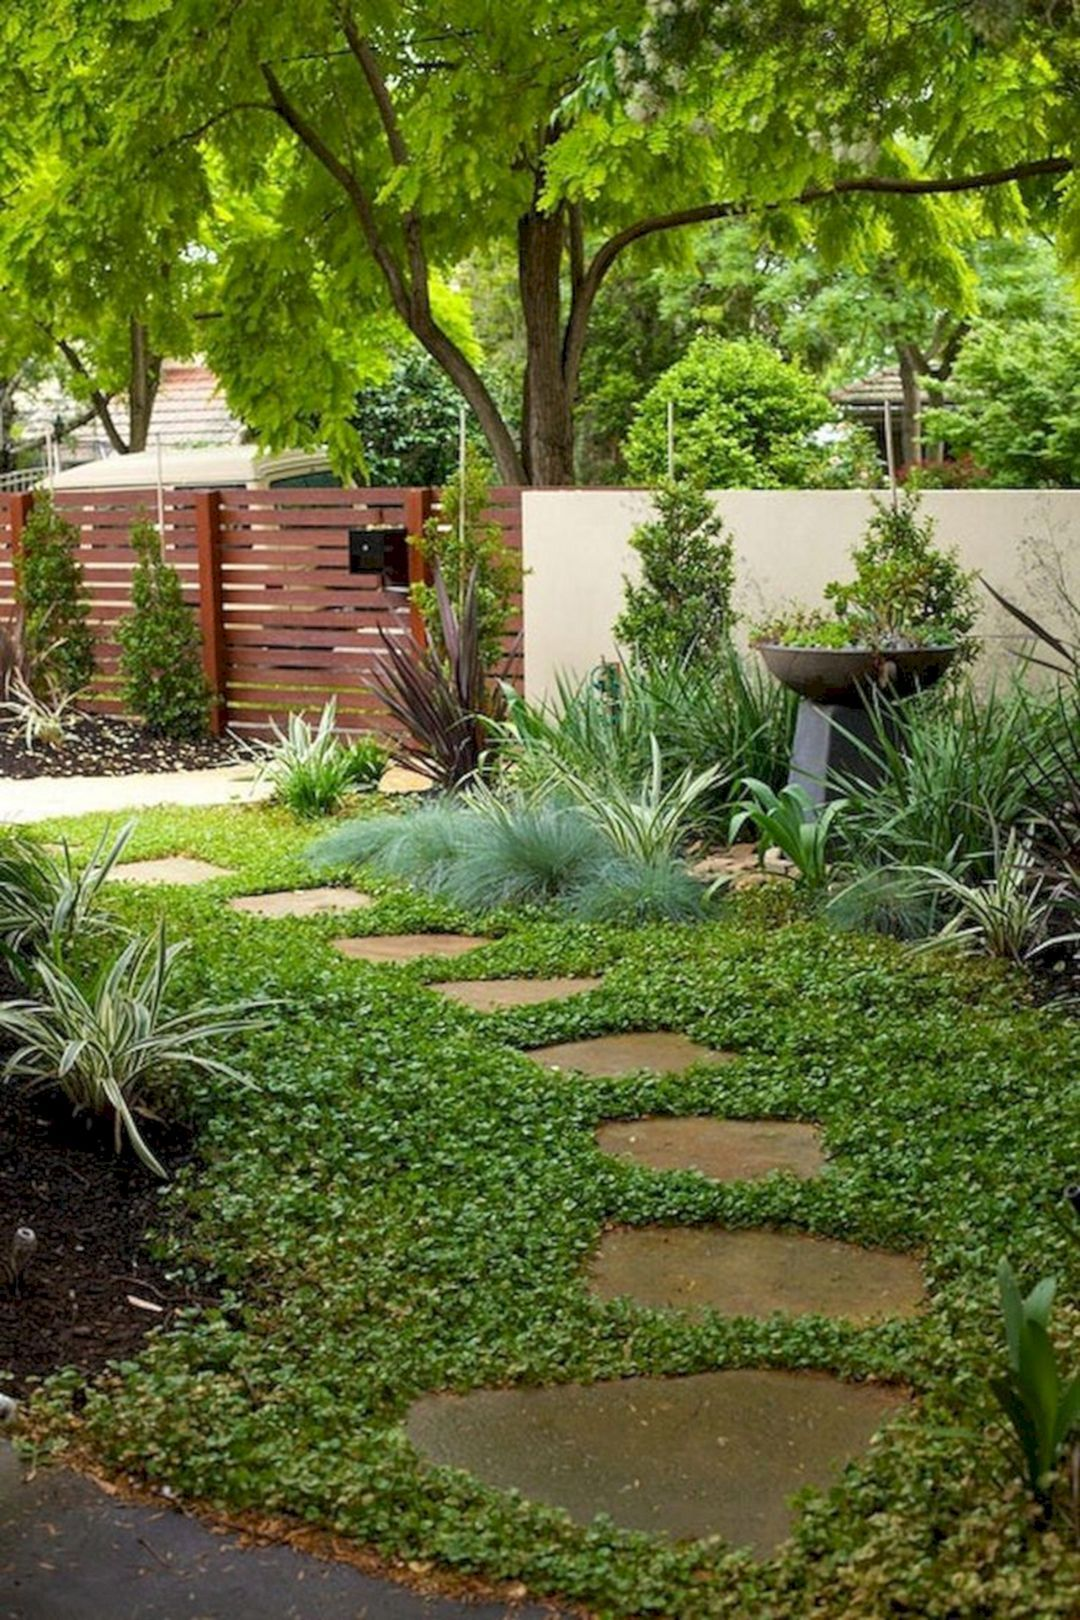 Photo of 12 Amazing DIY Garden Path To Increase Your Garden Style  #DIY #DIYGardenPathIdeas #GardenPat…